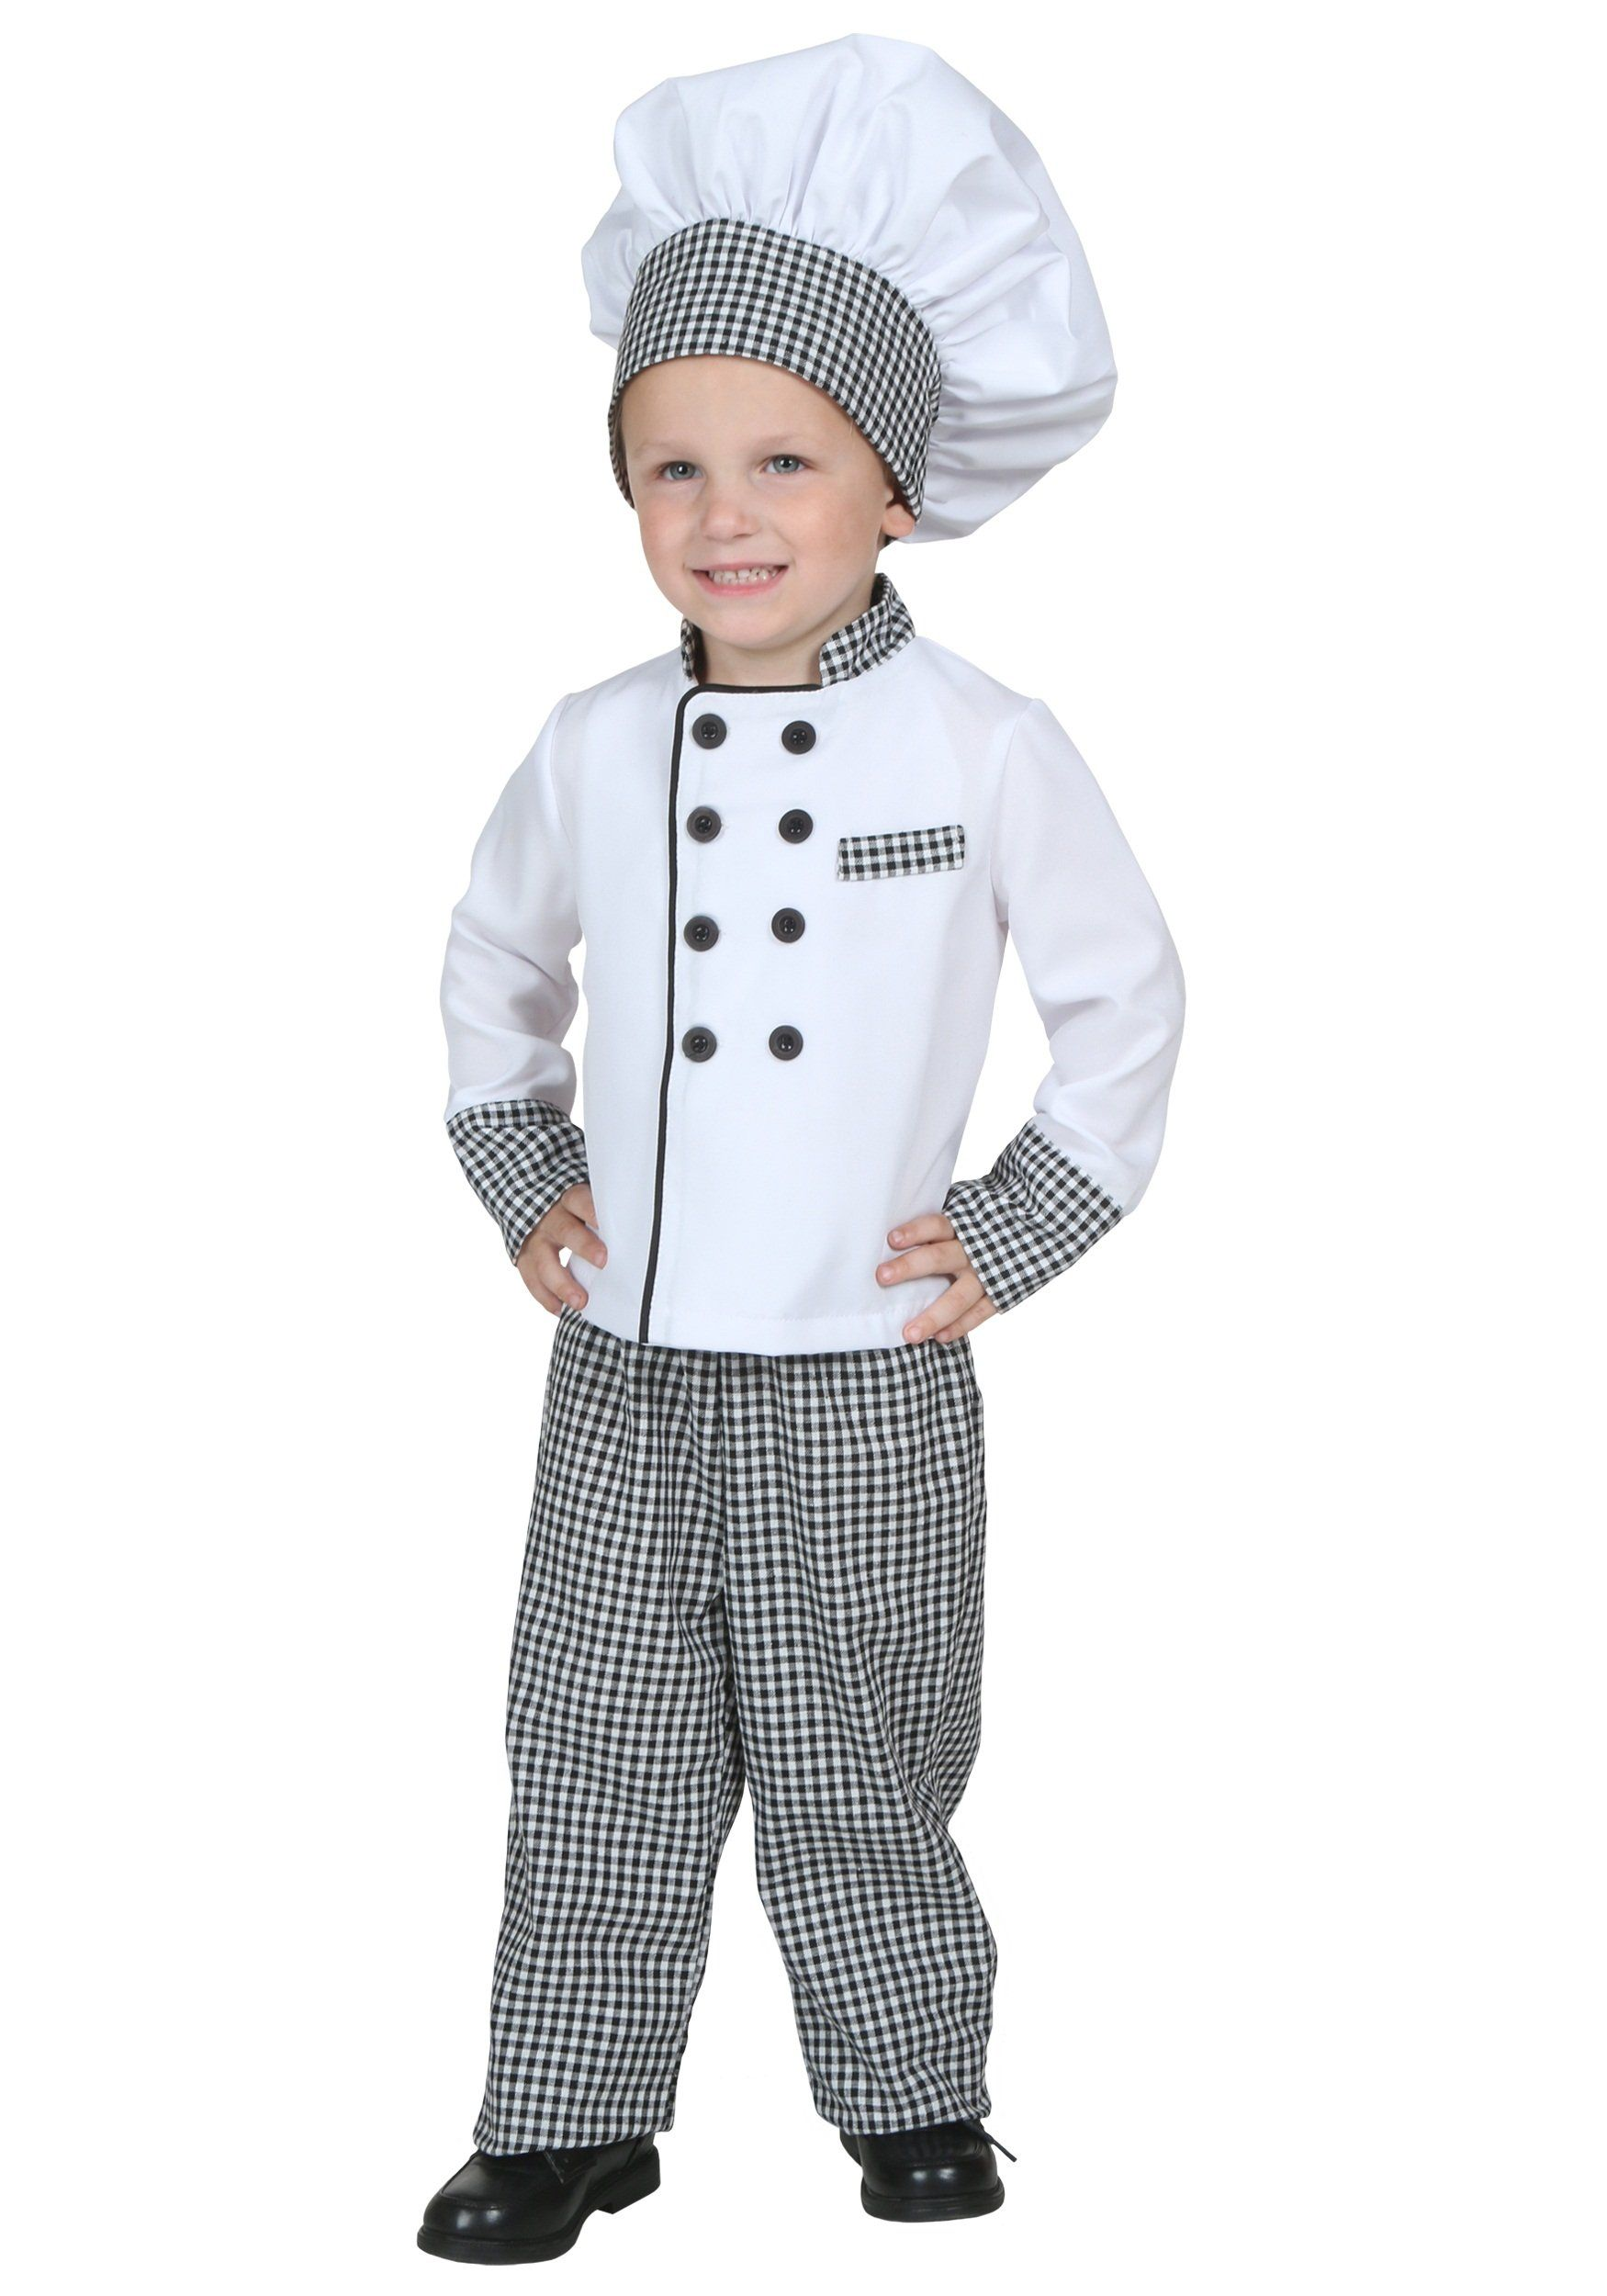 945e5b05216ed Toddler Chef Costume - 4T | Halloween | Chef costume, Kids chef ...